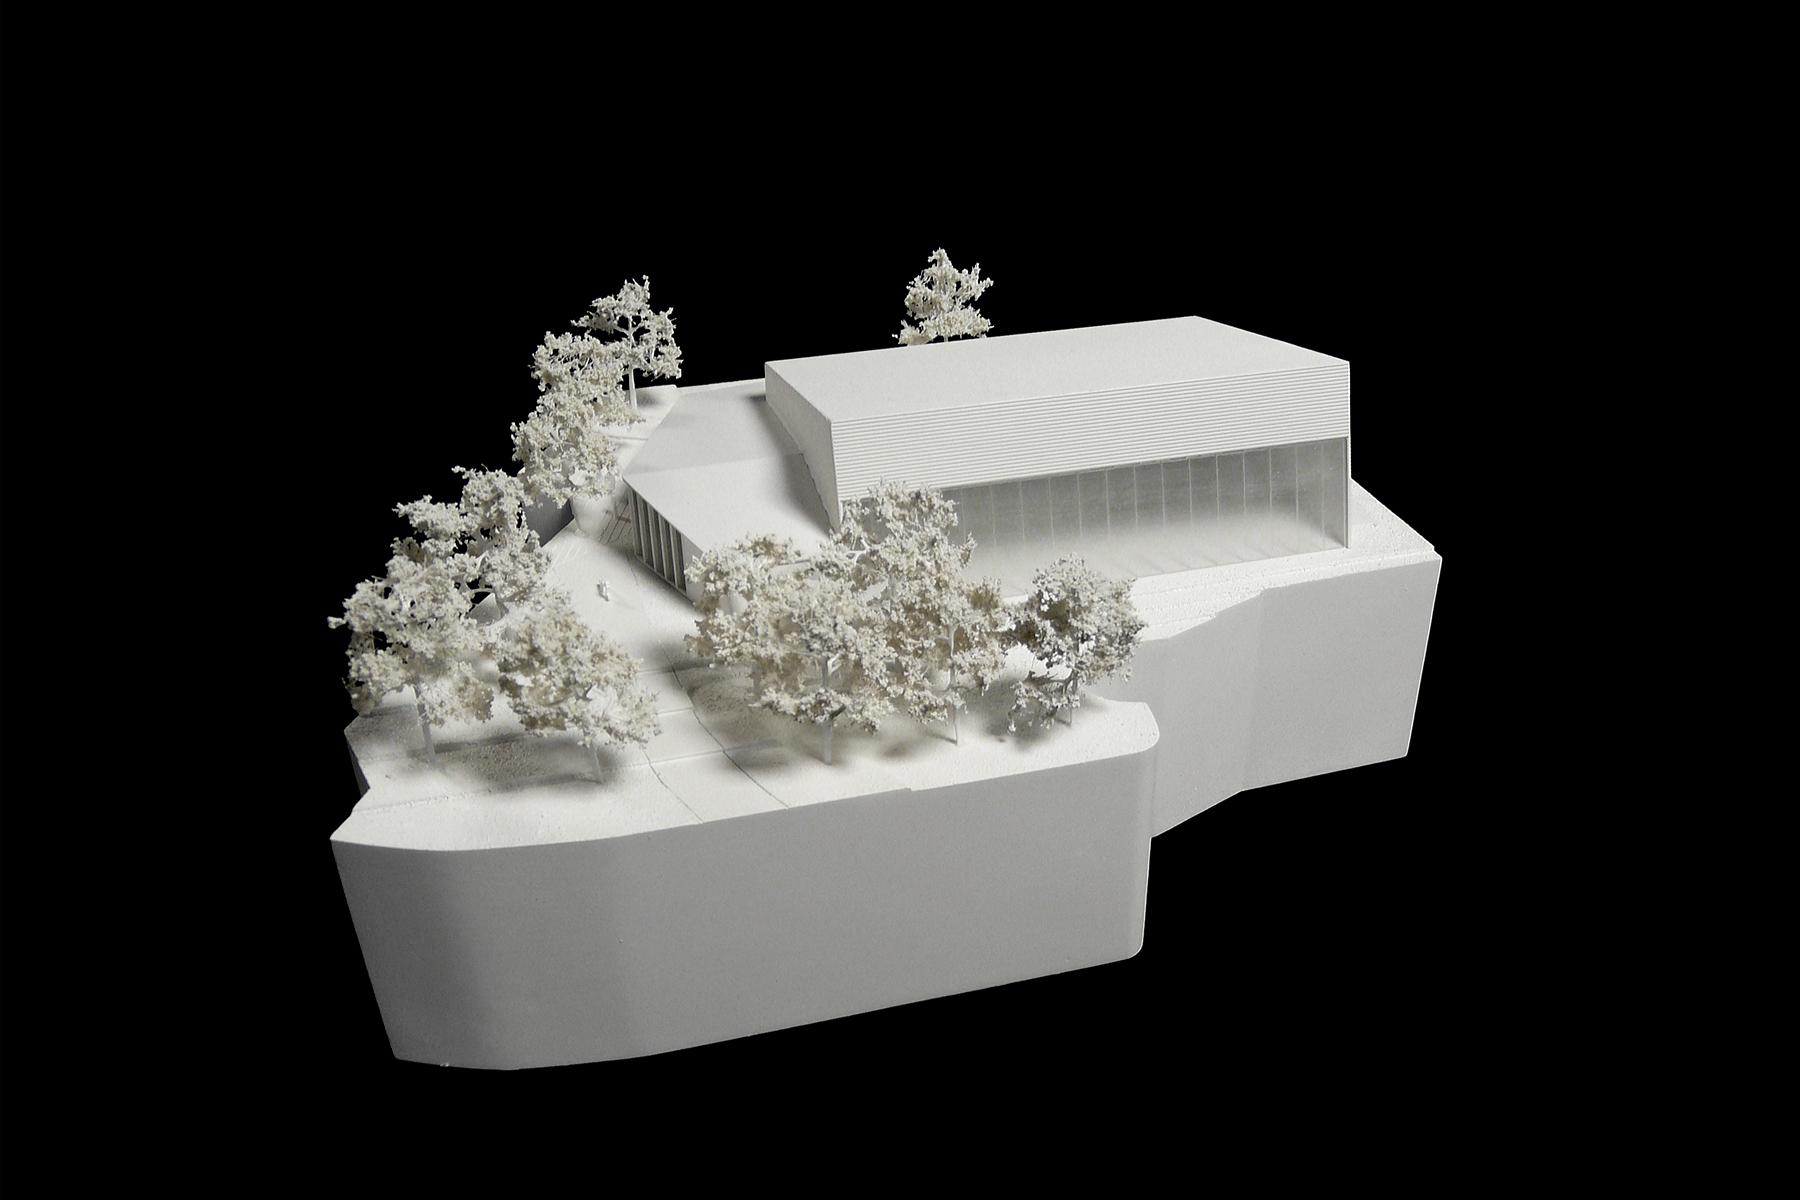 architekturmodell lyc e franco allemand b la berec. Black Bedroom Furniture Sets. Home Design Ideas